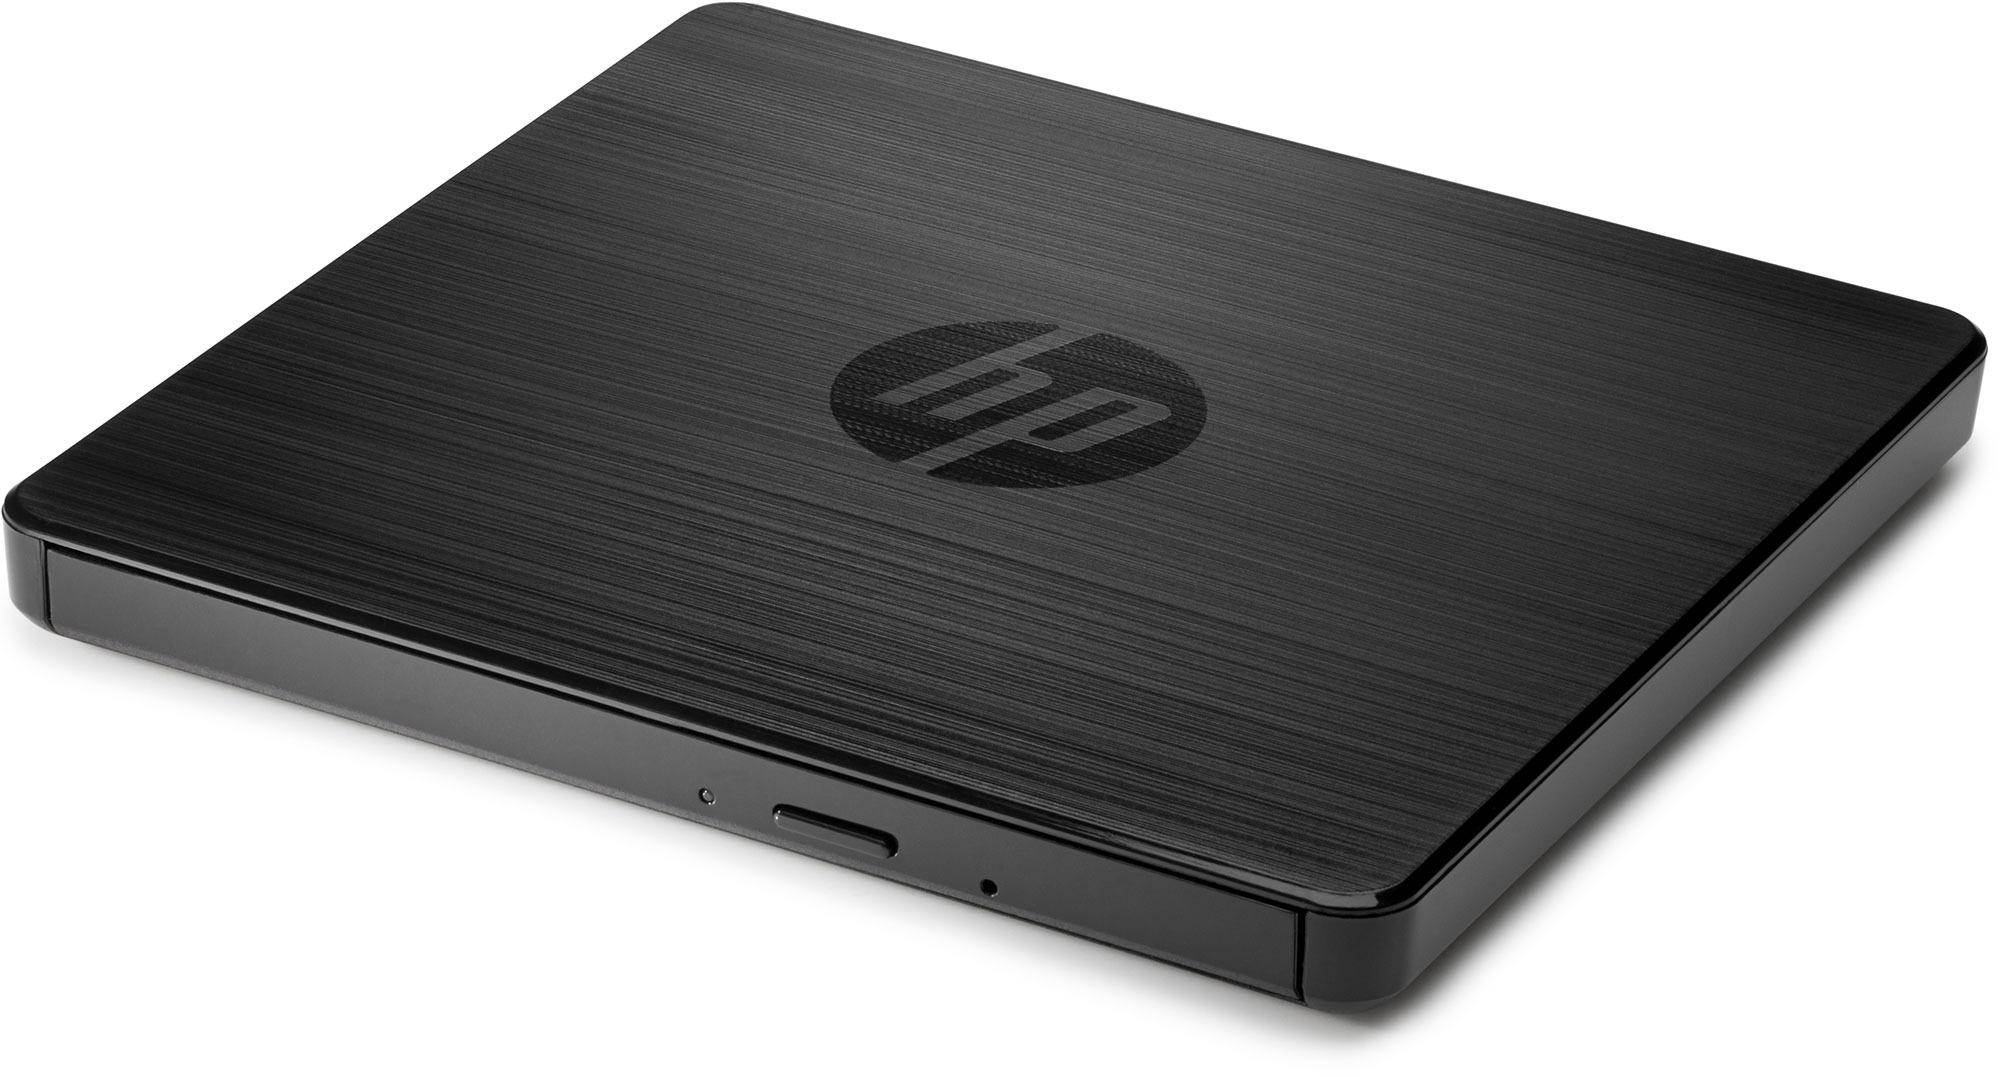 HP External USB Optical Drive - F2B56AA